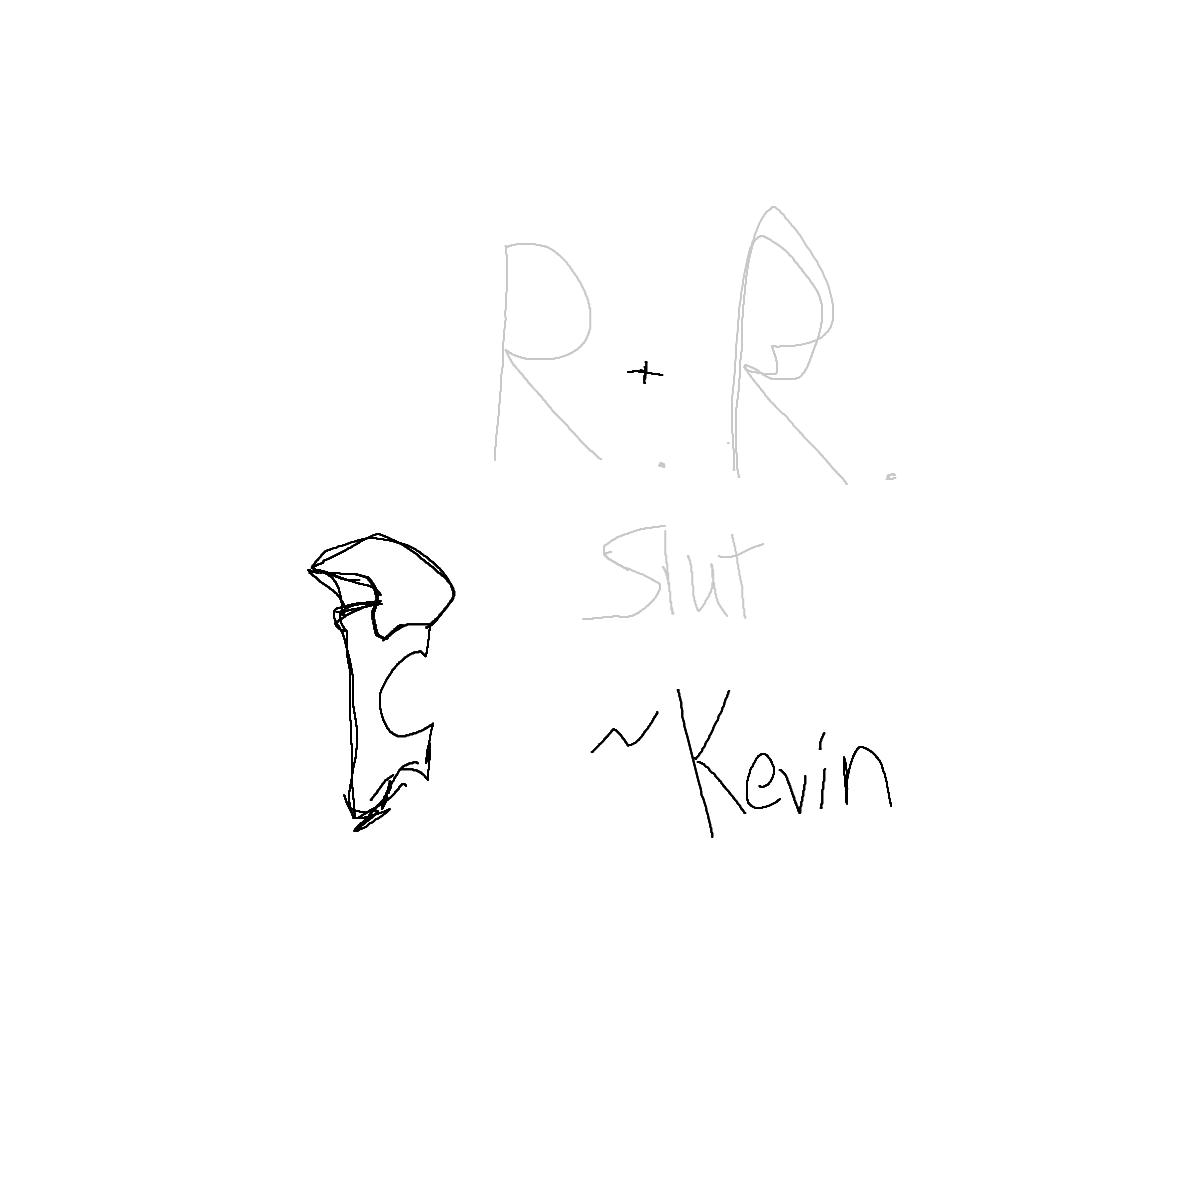 BAAAM drawing#9171 lat:32.9643859863281250lng: -96.7331390380859400